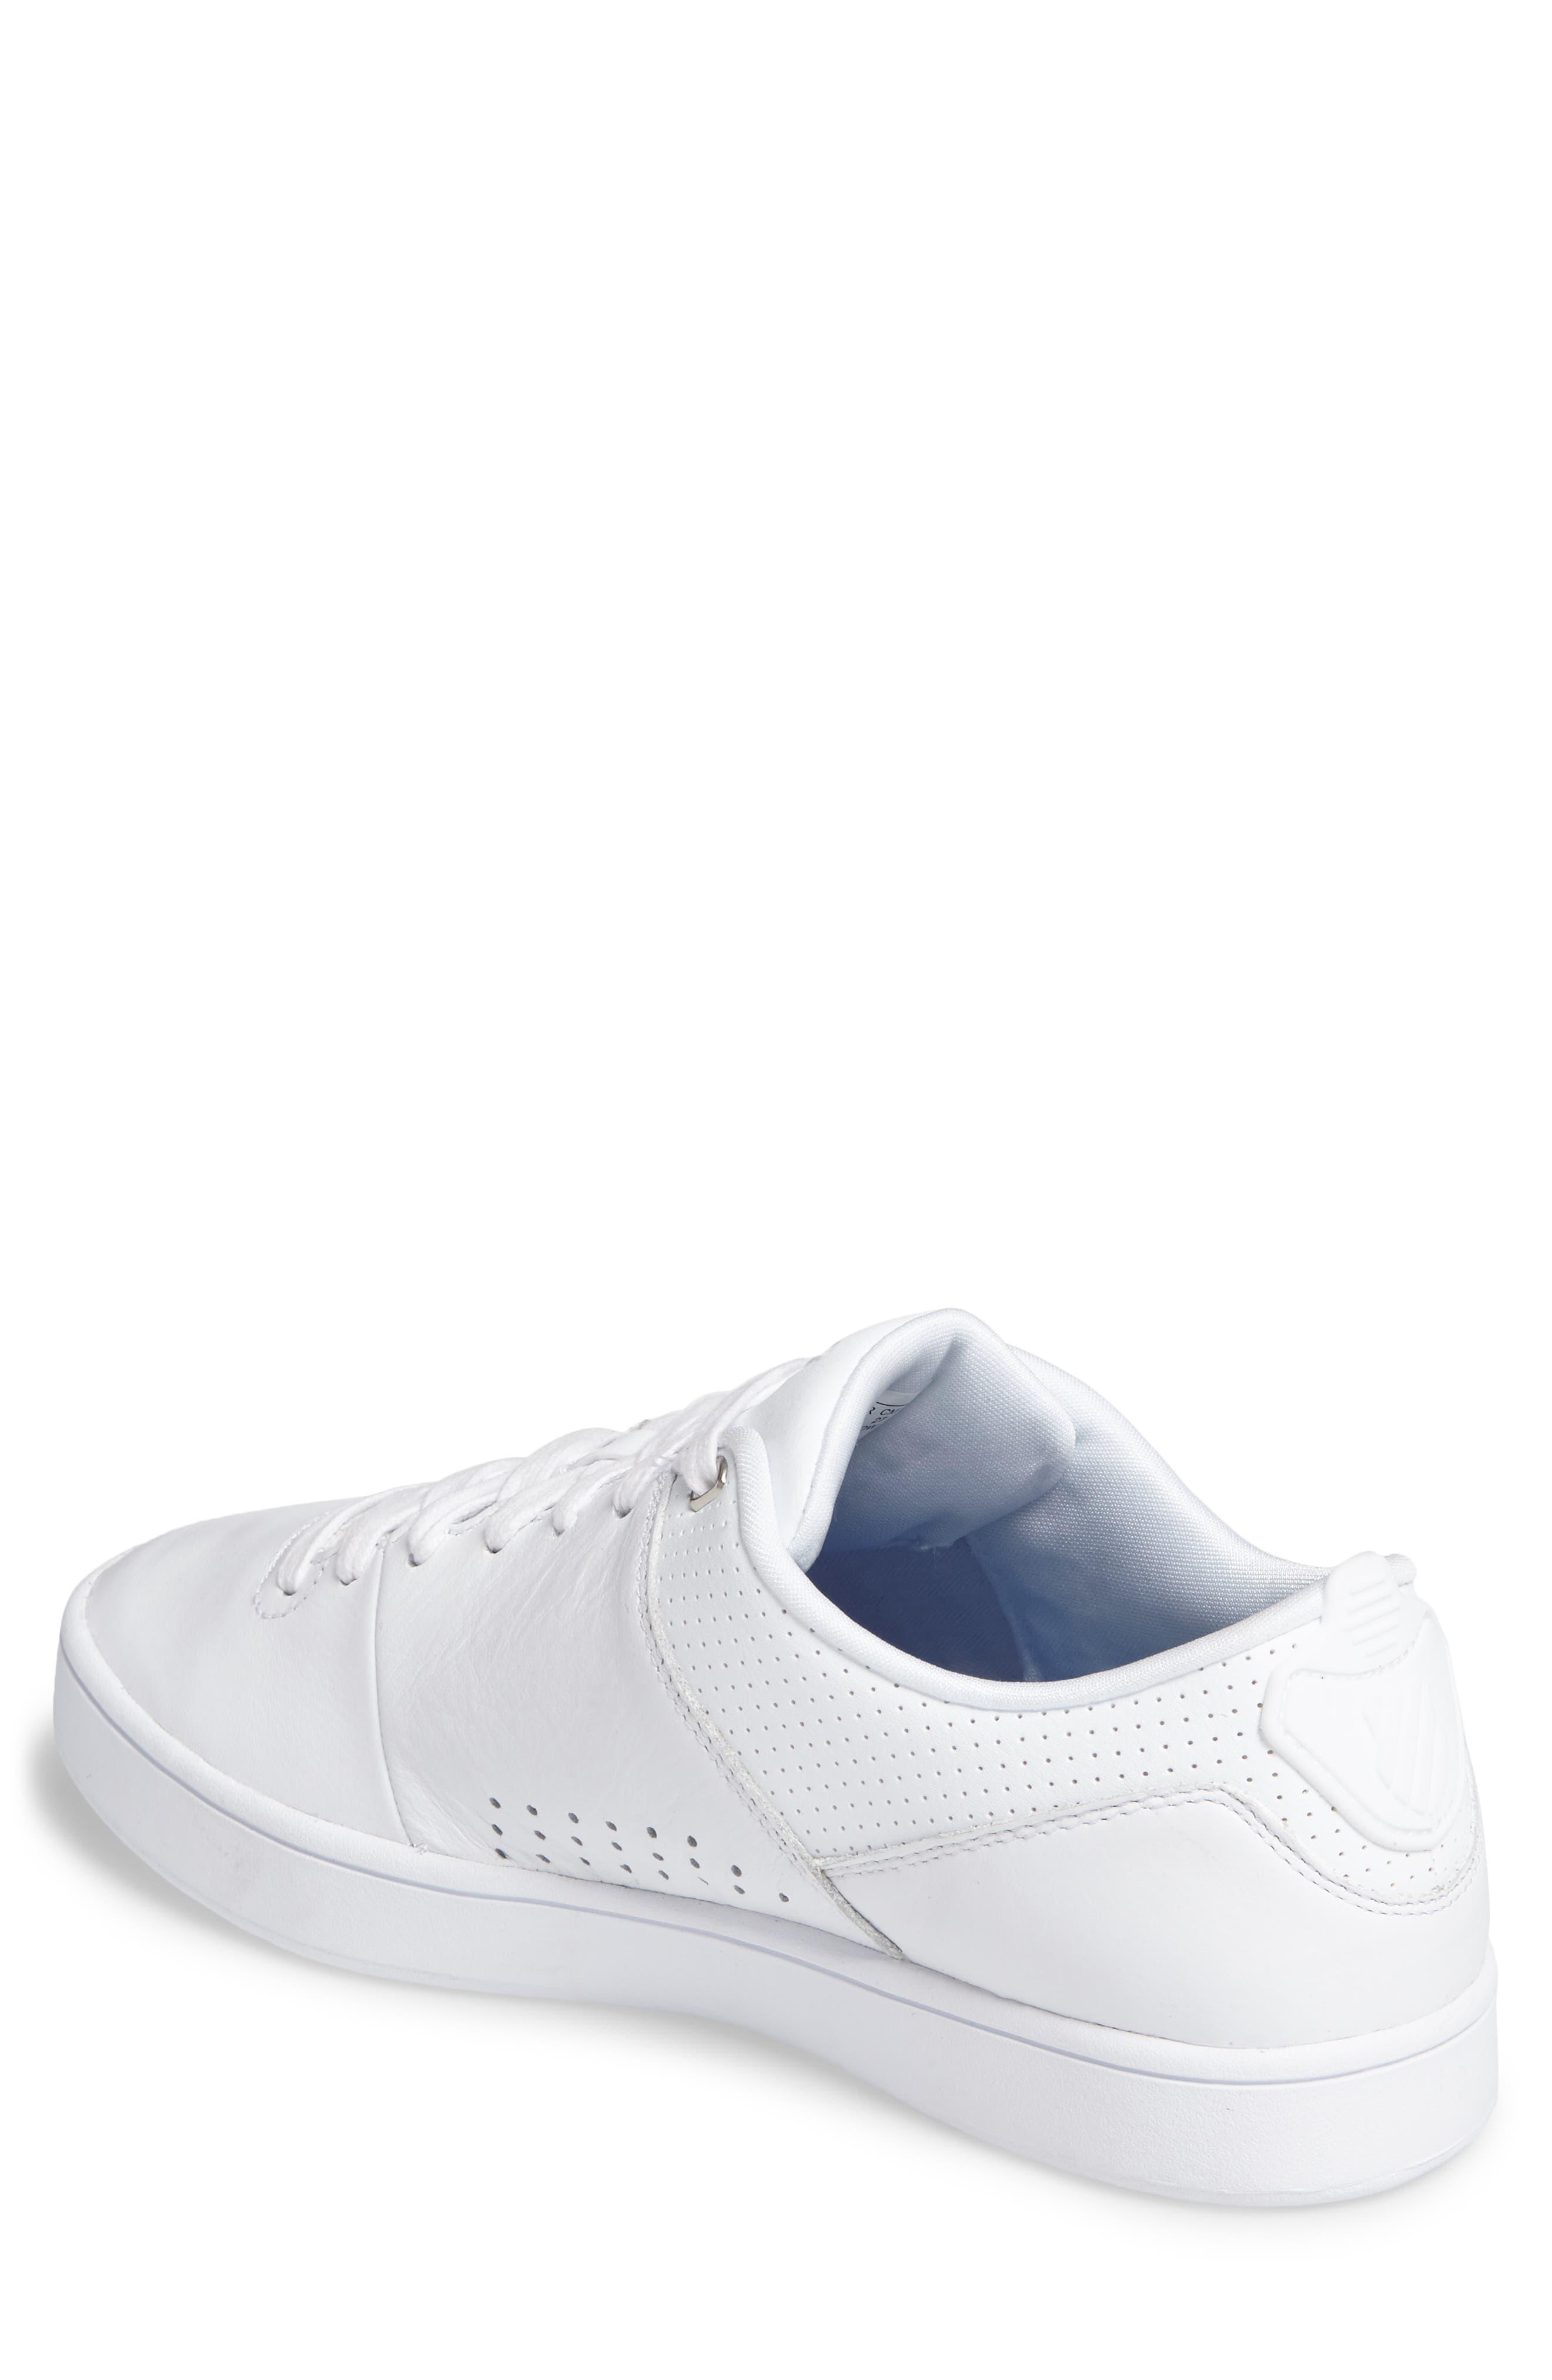 Court Westan Sneaker,                             Alternate thumbnail 4, color,